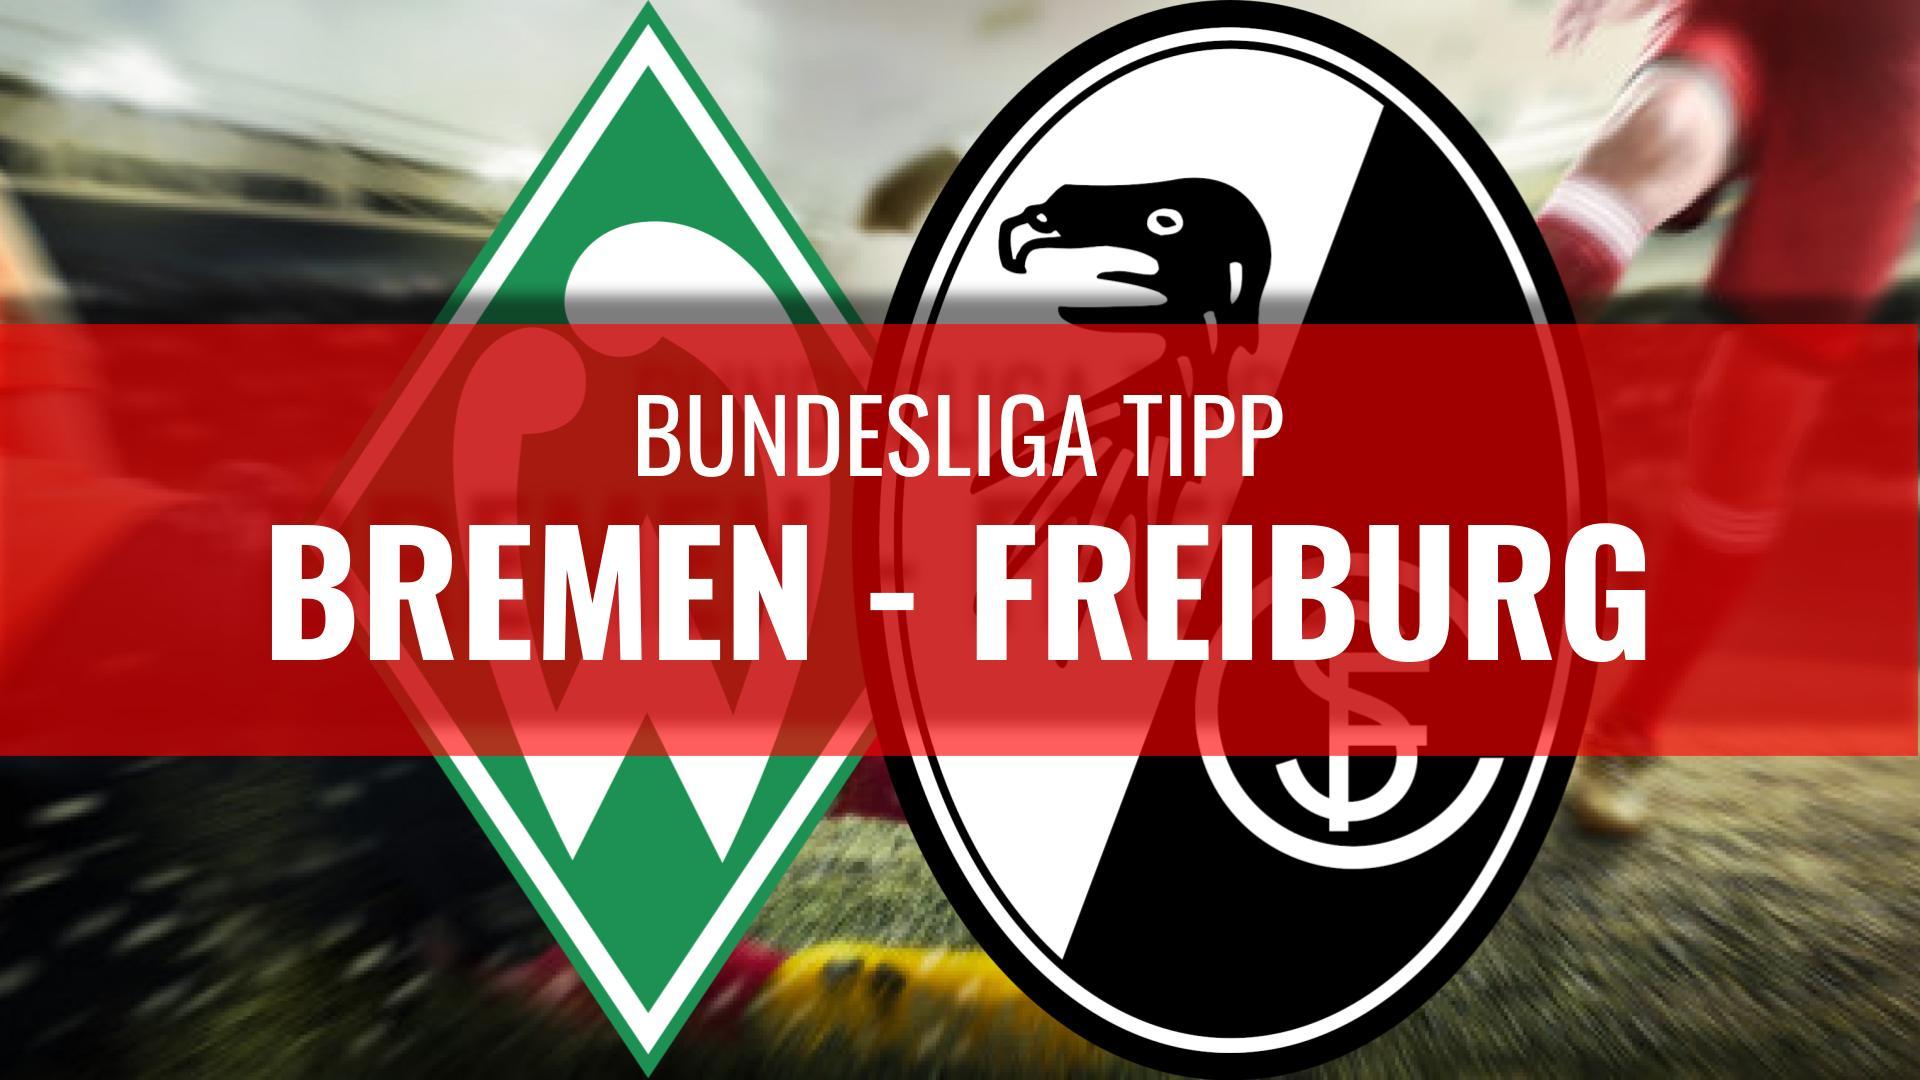 BREMEN - FREIBURG-Bundesliga-Wett-Tipps-21